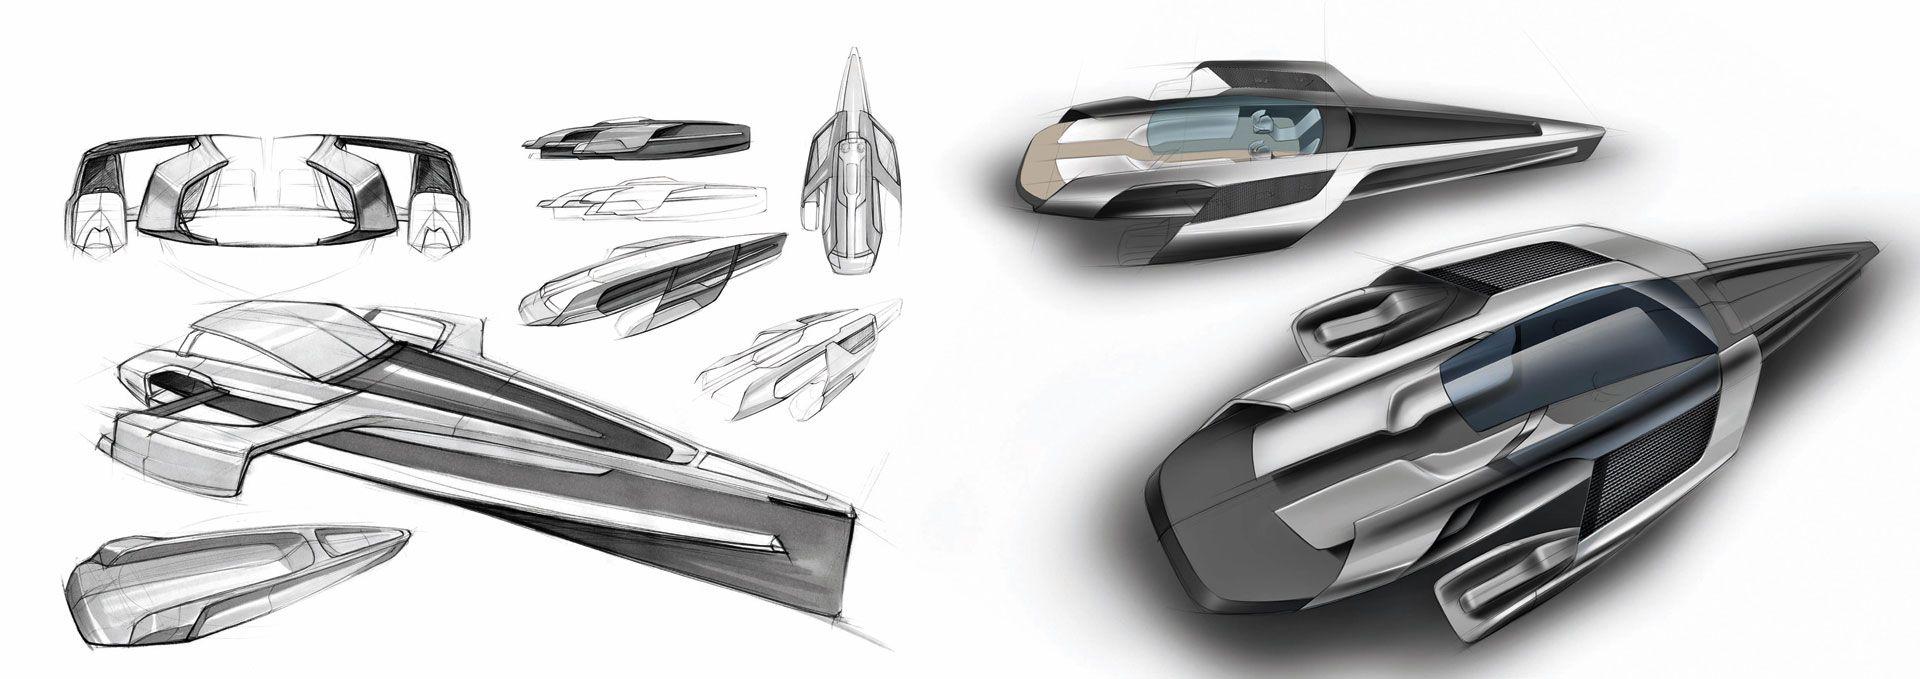 Audi Trimaran Concept Design Sketch Boats Pinterest Audi